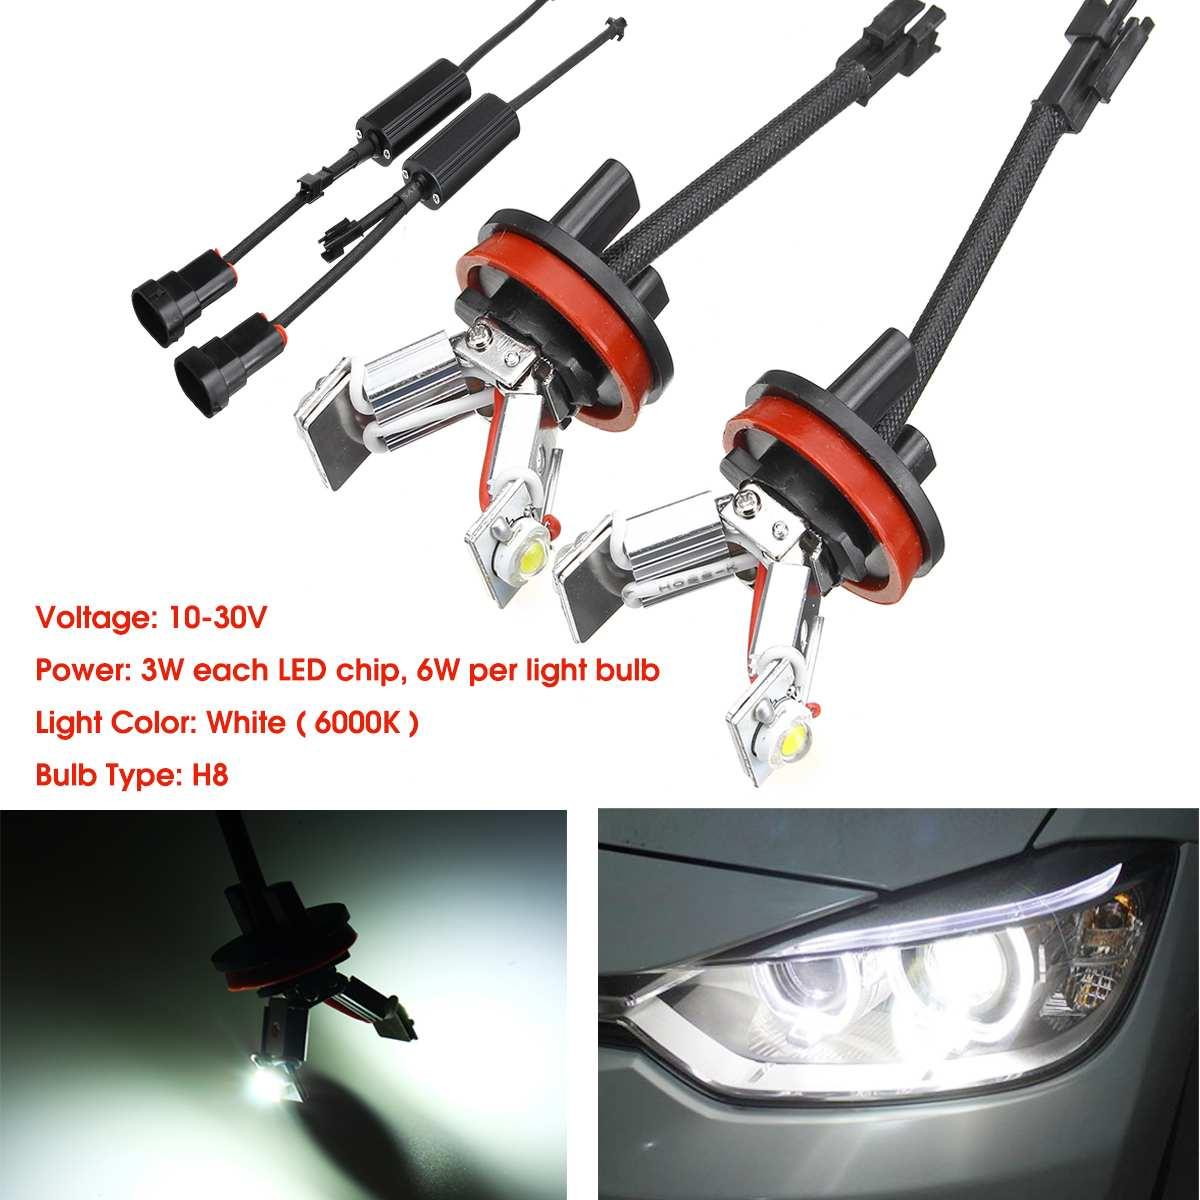 2Pcs LED Angel Eyes Halo RING Light Lamp H8 Bulb For BMW E82 E87 E90 E91 E92 M3 E93 E60 E61 E63 E70 X5 E71 X6 E89 Z4 6000K